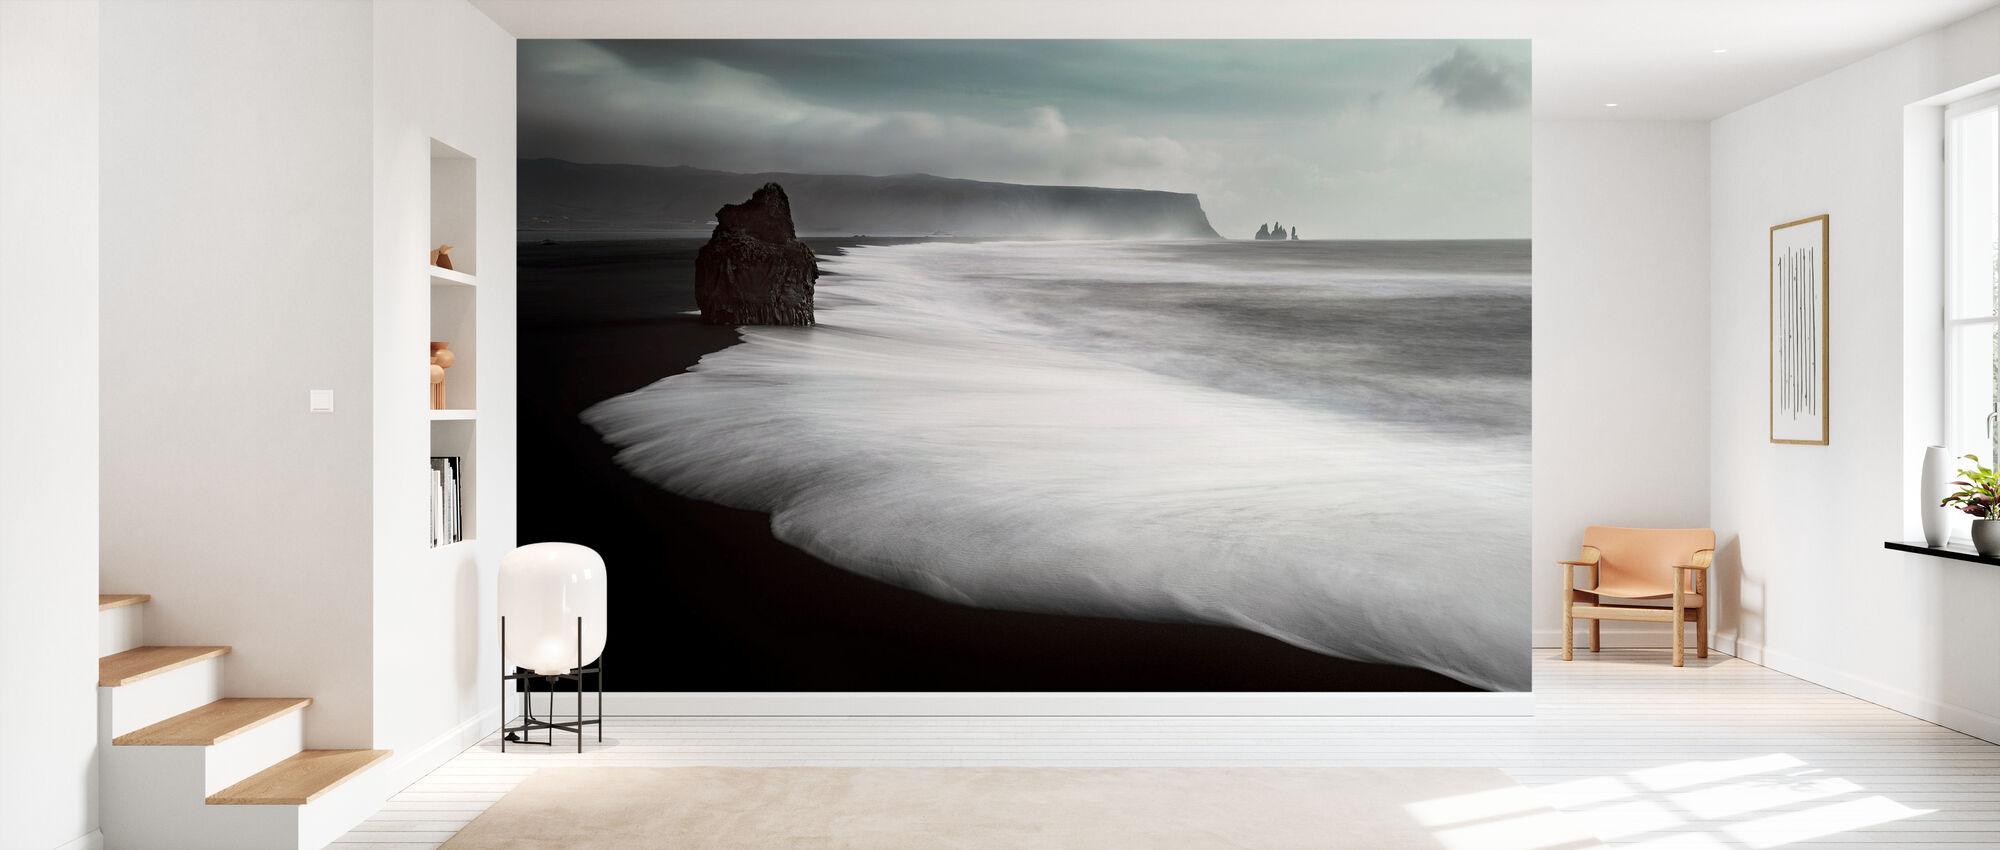 The Black Beach - Wallpaper - Hallway